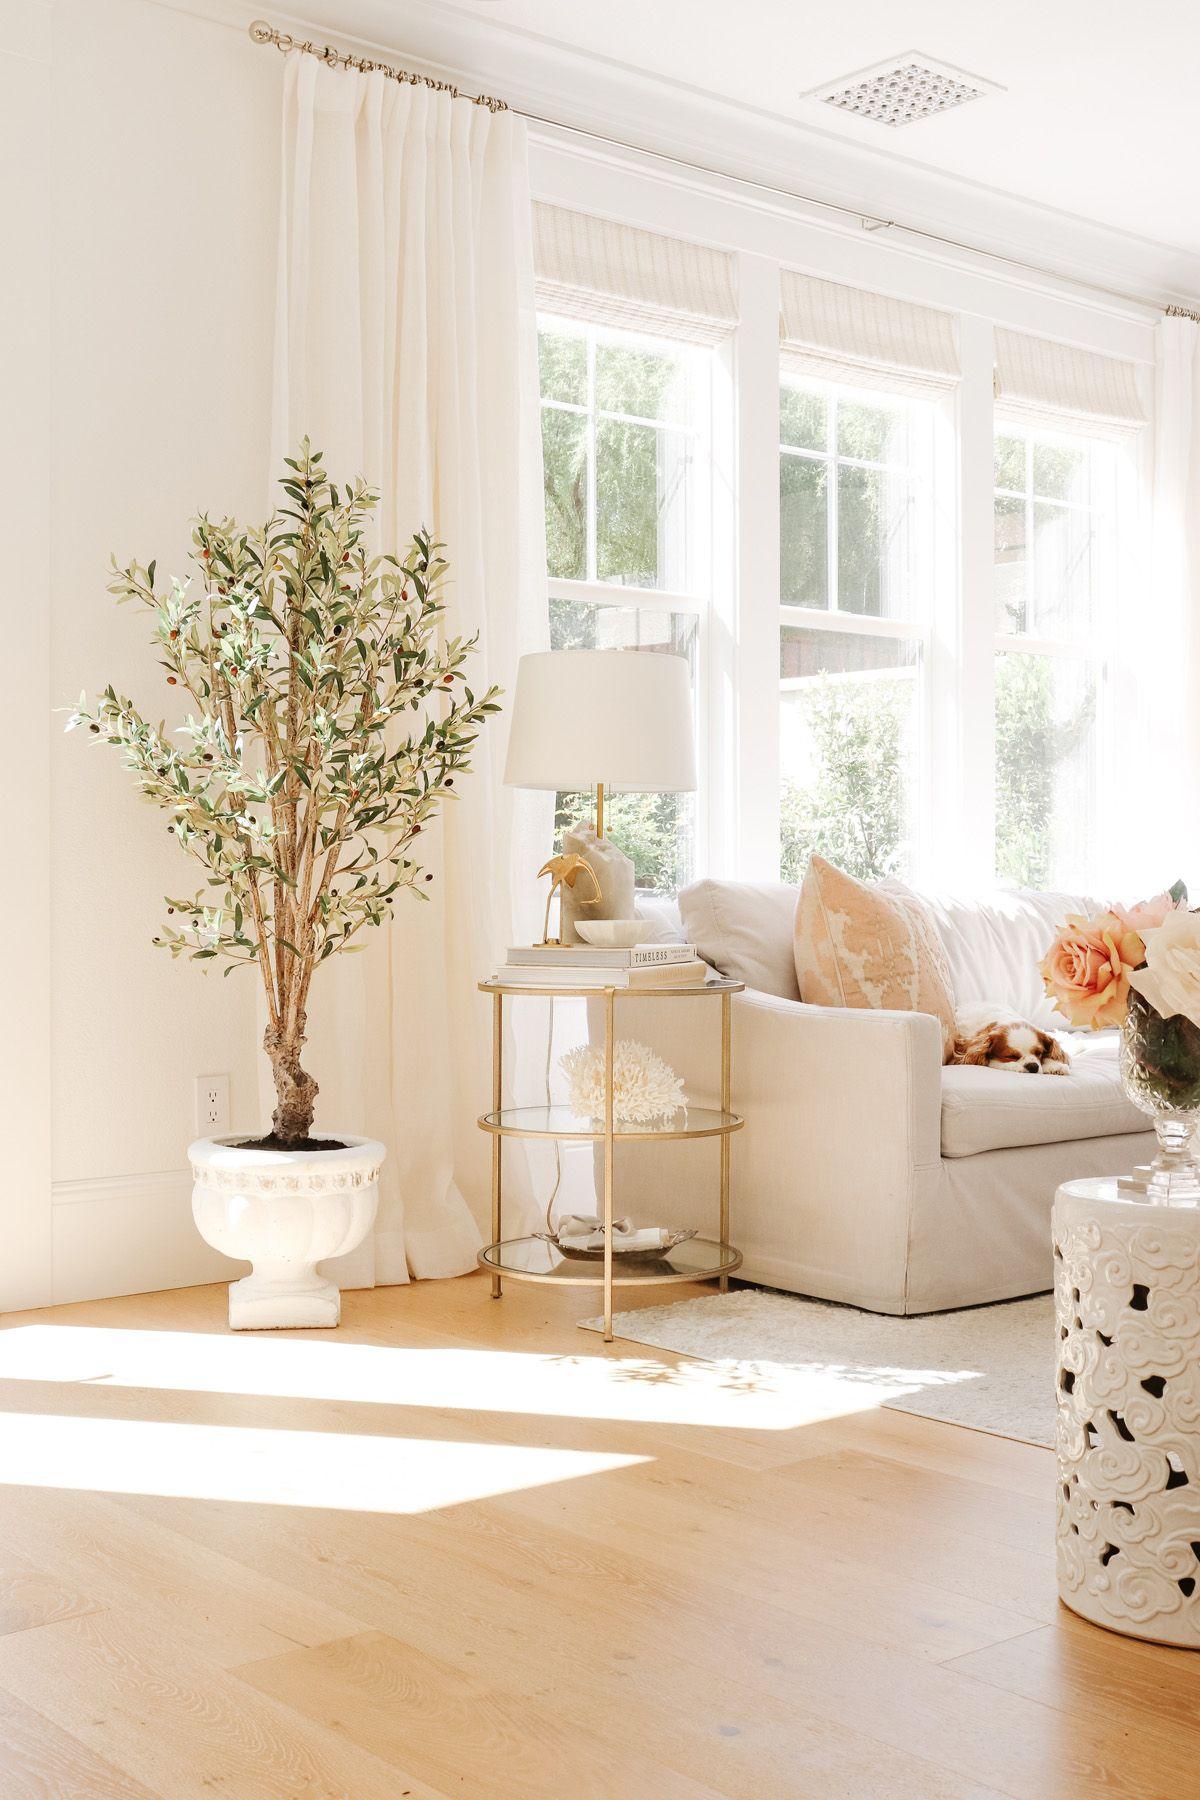 Wayfair Wayday 2019 HUGE Storewide Sale Furniture sale